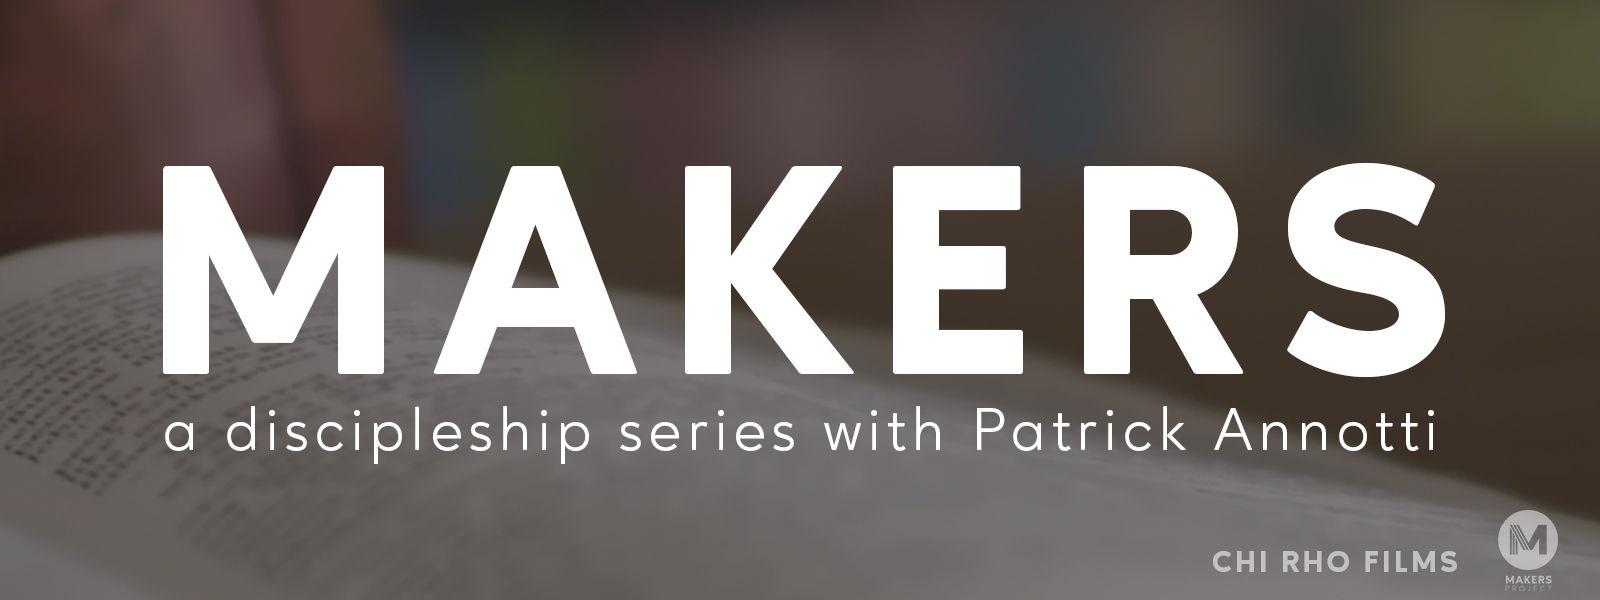 MAKERS Discipleship Series